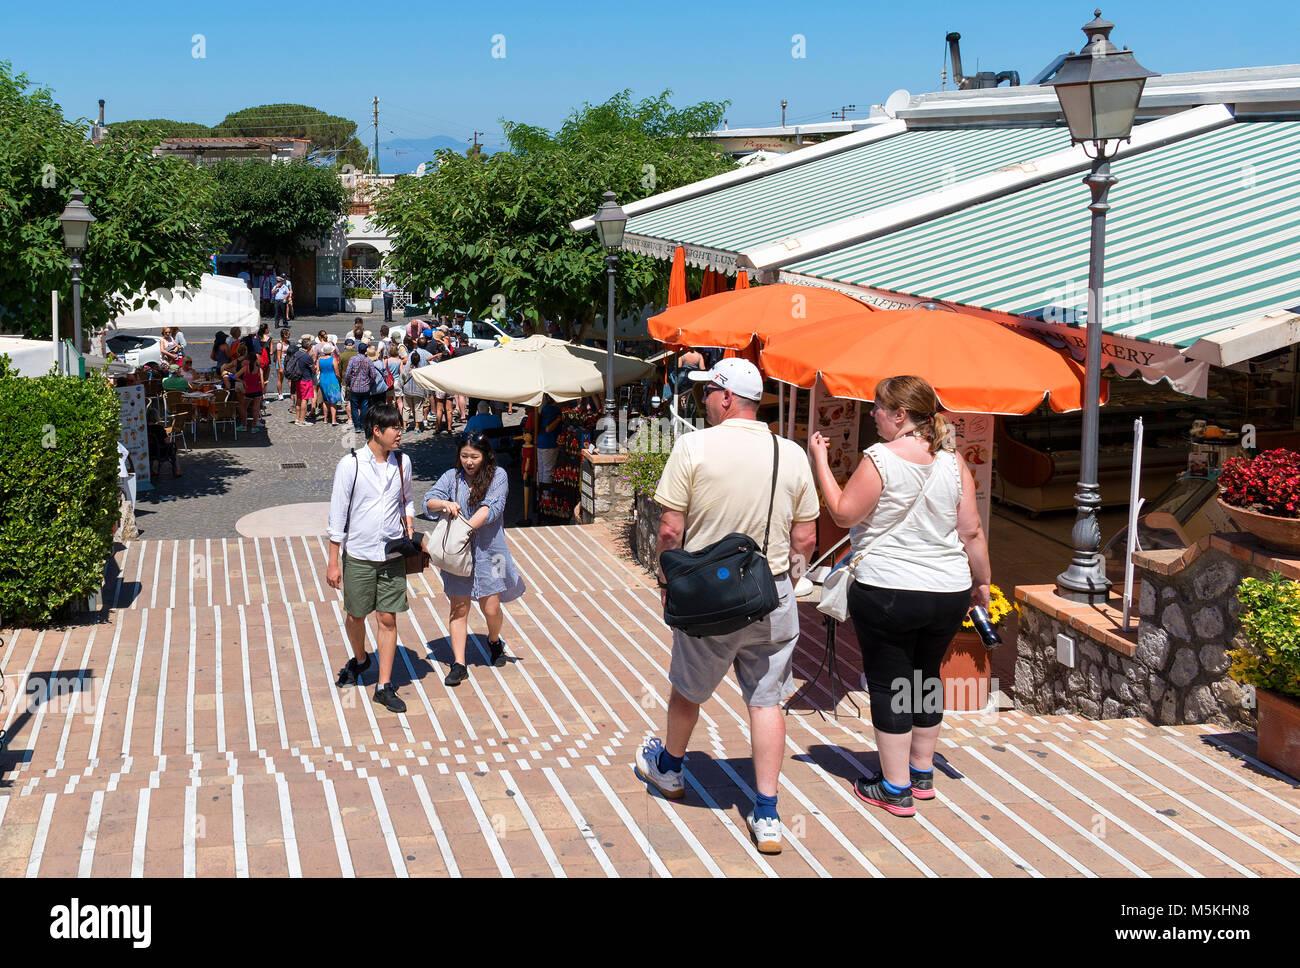 tourists on piazza vittoria in anacapri on the island of capri, italy. - Stock Image